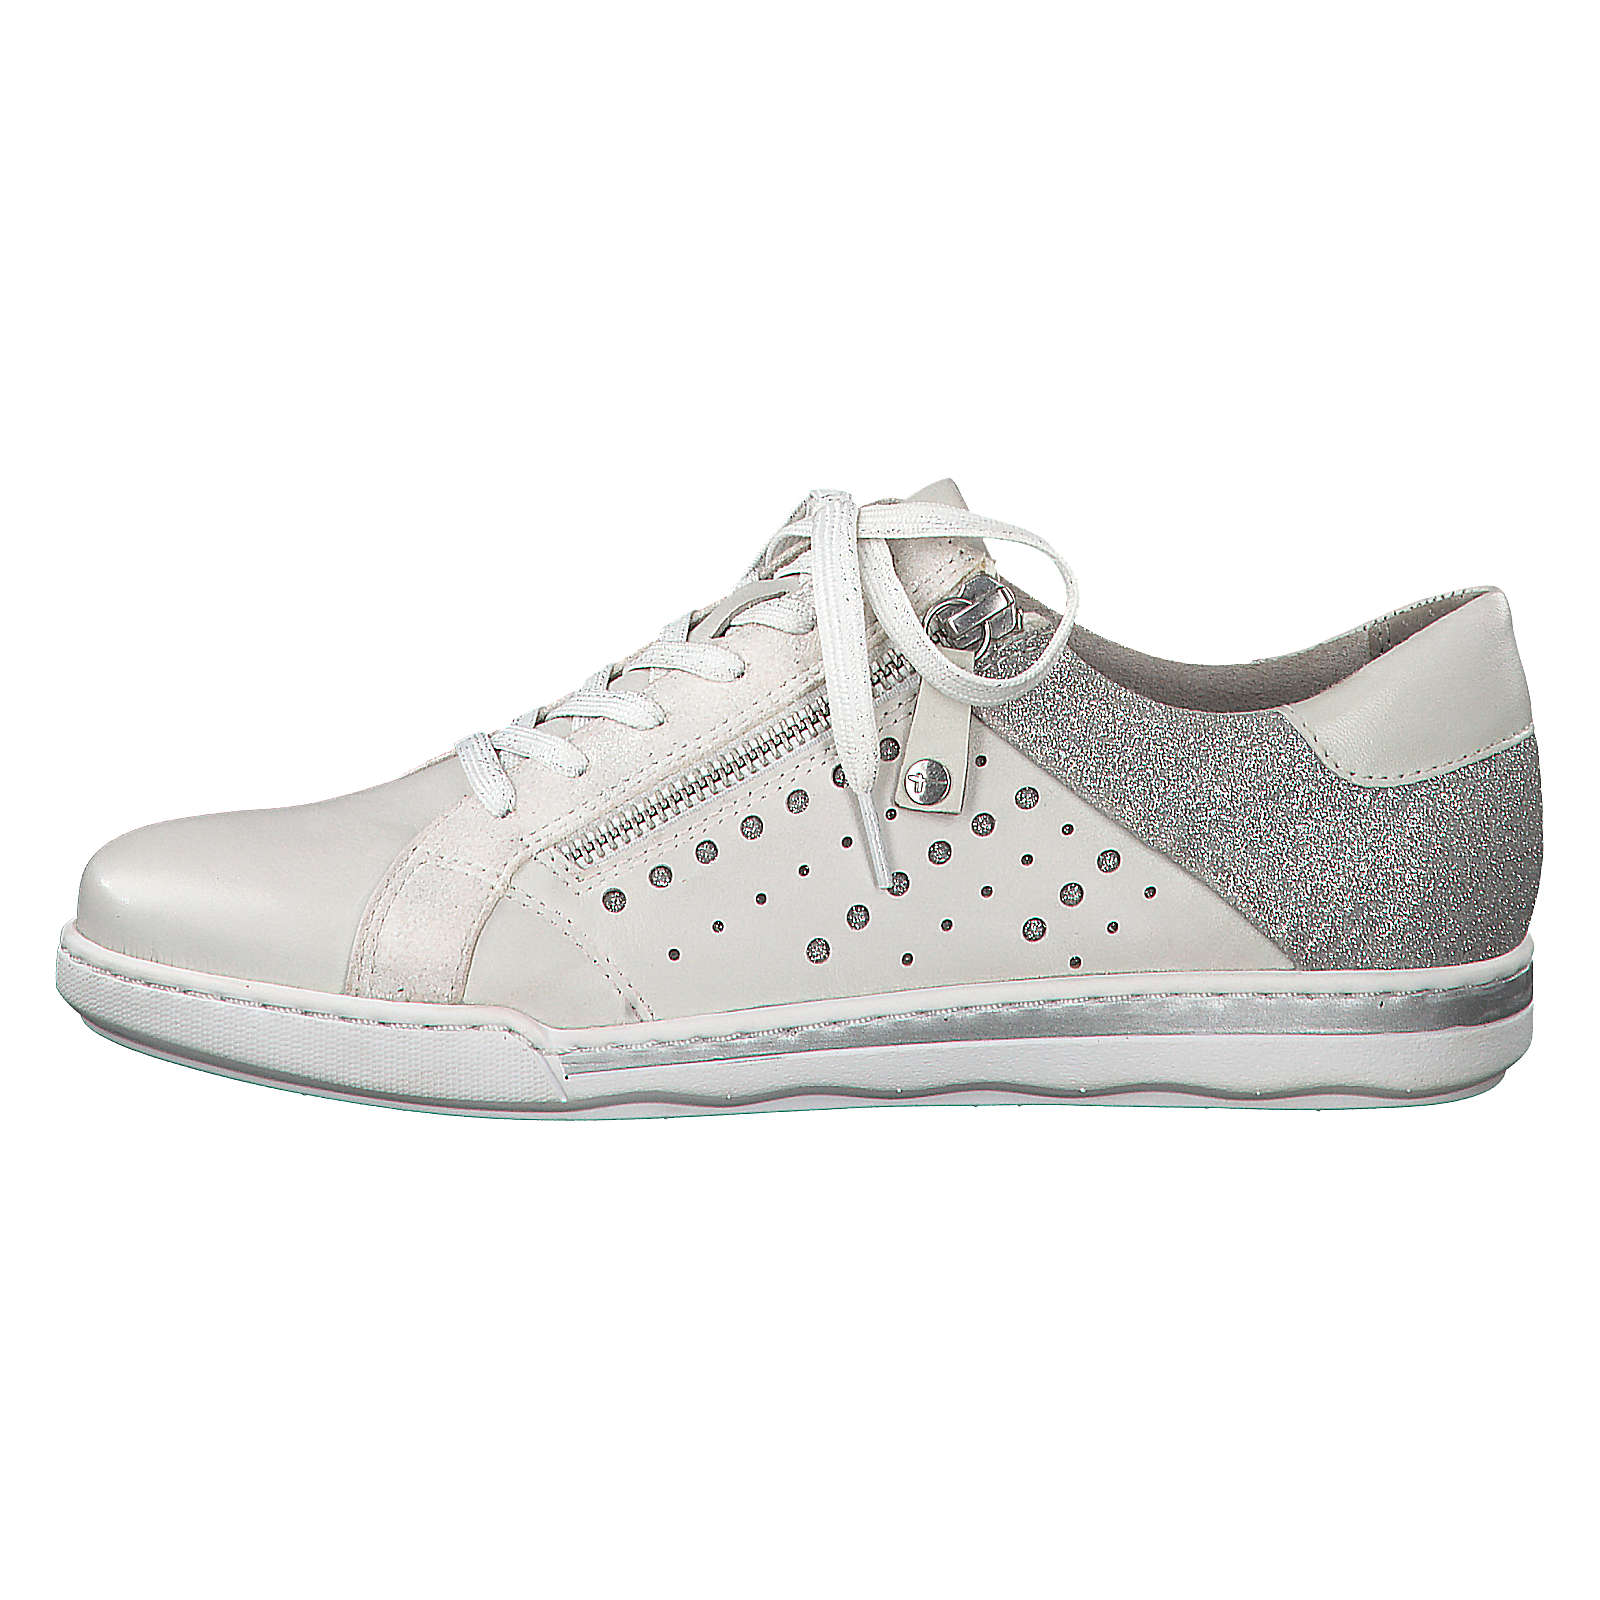 Tamaris Sneakers Low weiß Damen Gr. 36